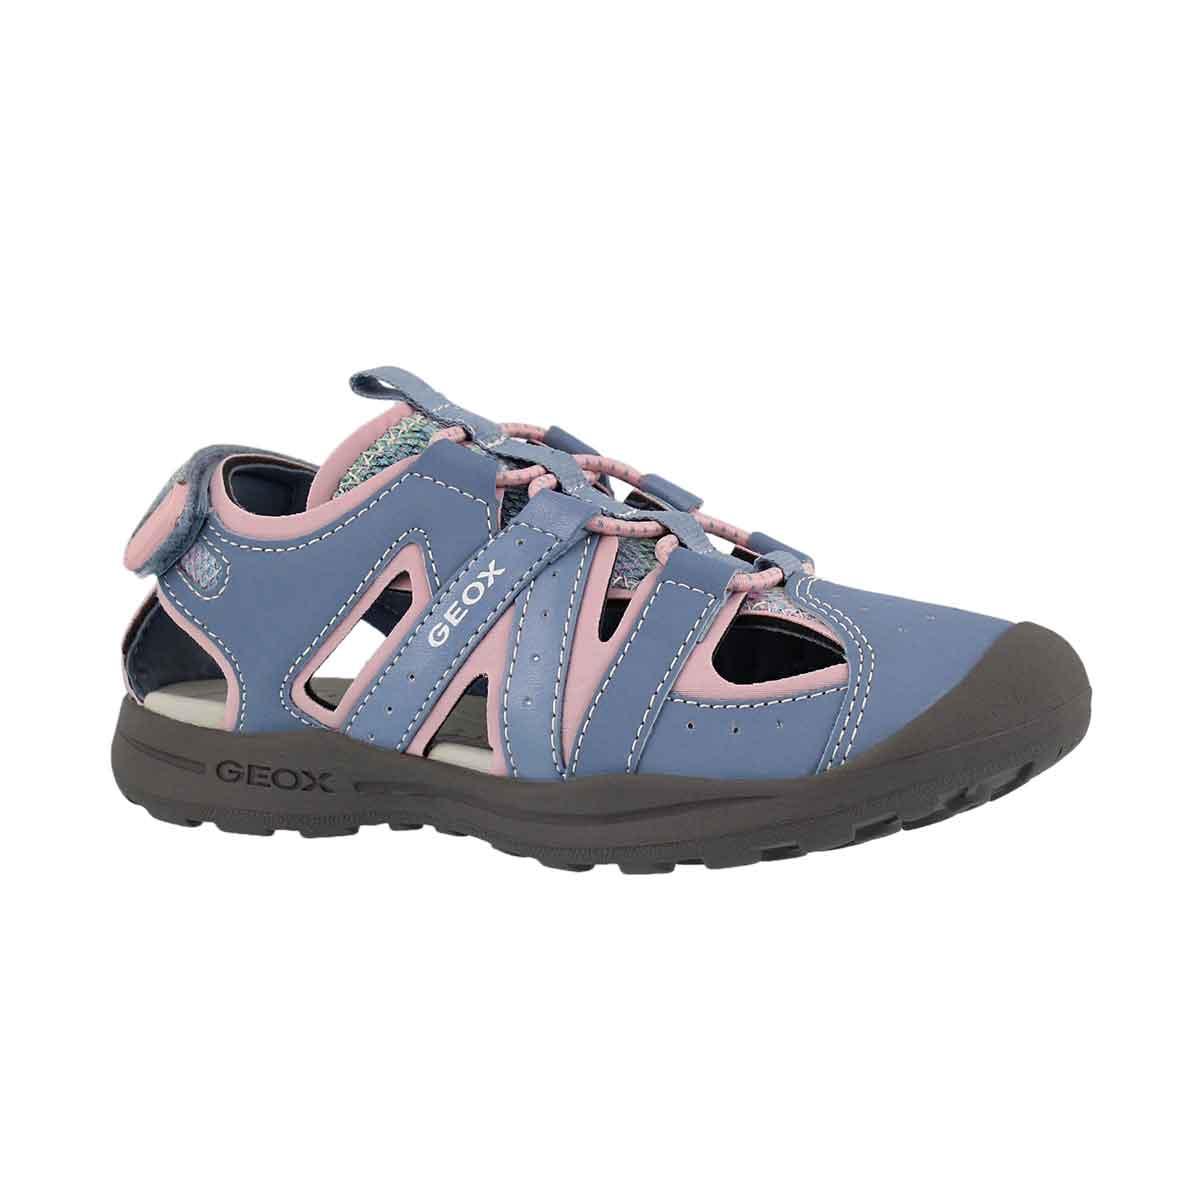 Girls' VANIETT sky/ pink fisherman sandals